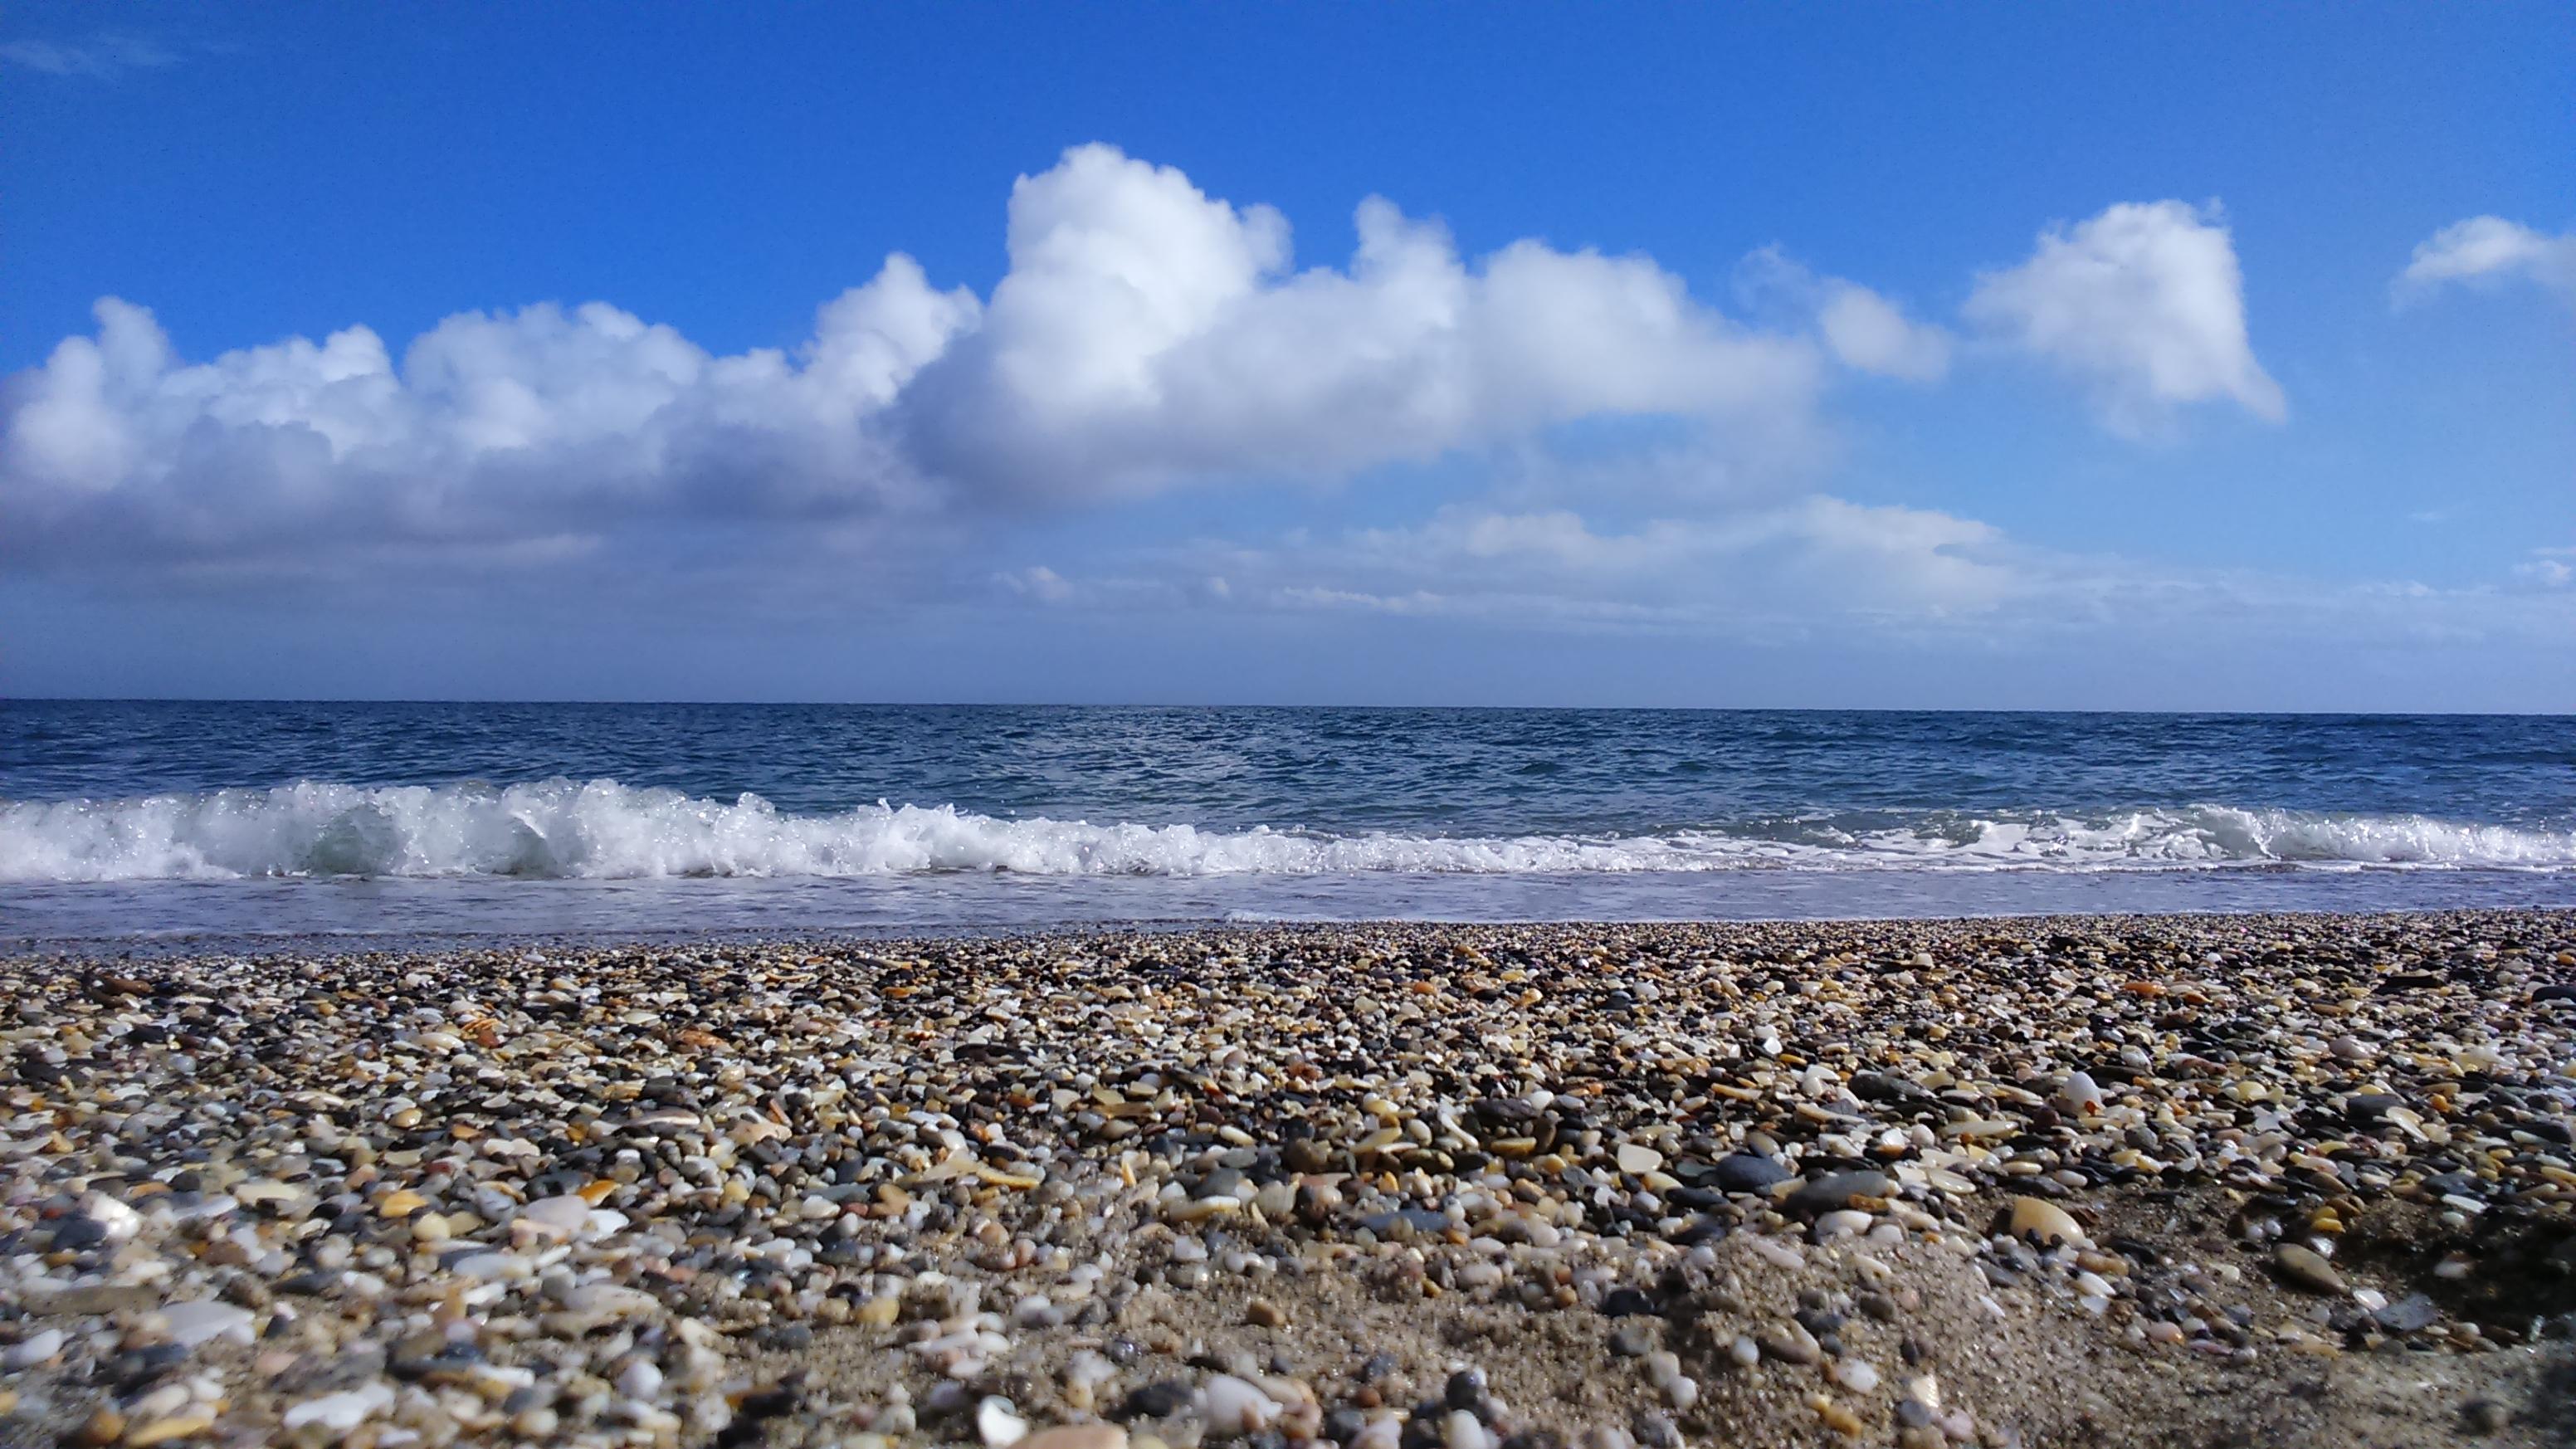 Playa de Mijas 12, Bay, Beach, Cielo, Ocean, HQ Photo